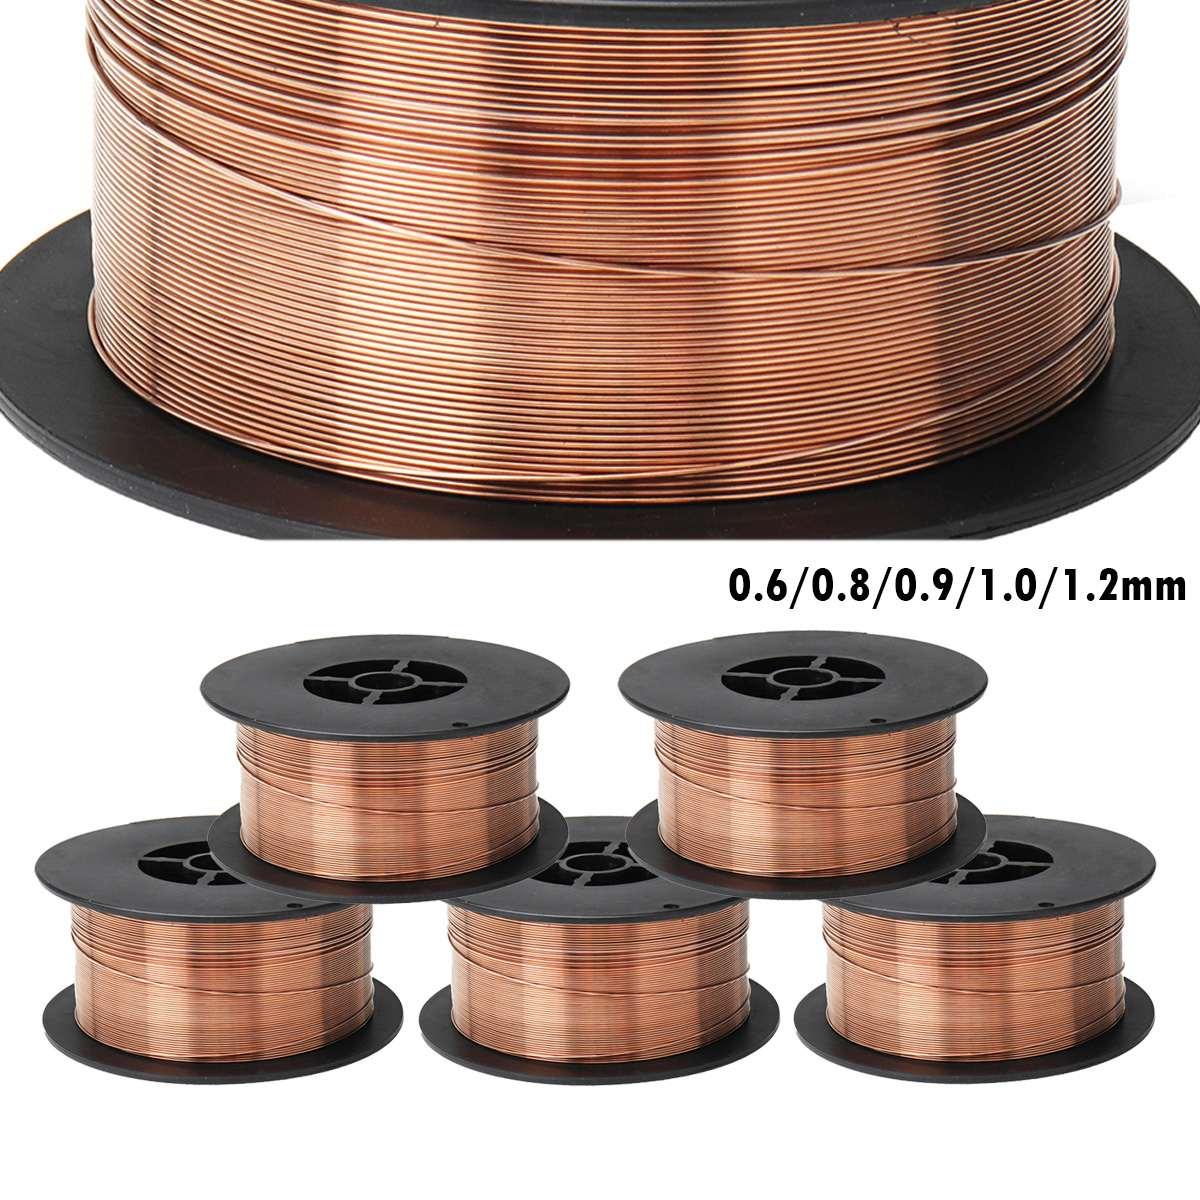 0 6 0 8 0 9 1 0 1 2mm 1KG Carbon Steel Gas Shielded Welding Wire Mild Steel ER70S-6   ER50-6 MIG Welding Wires